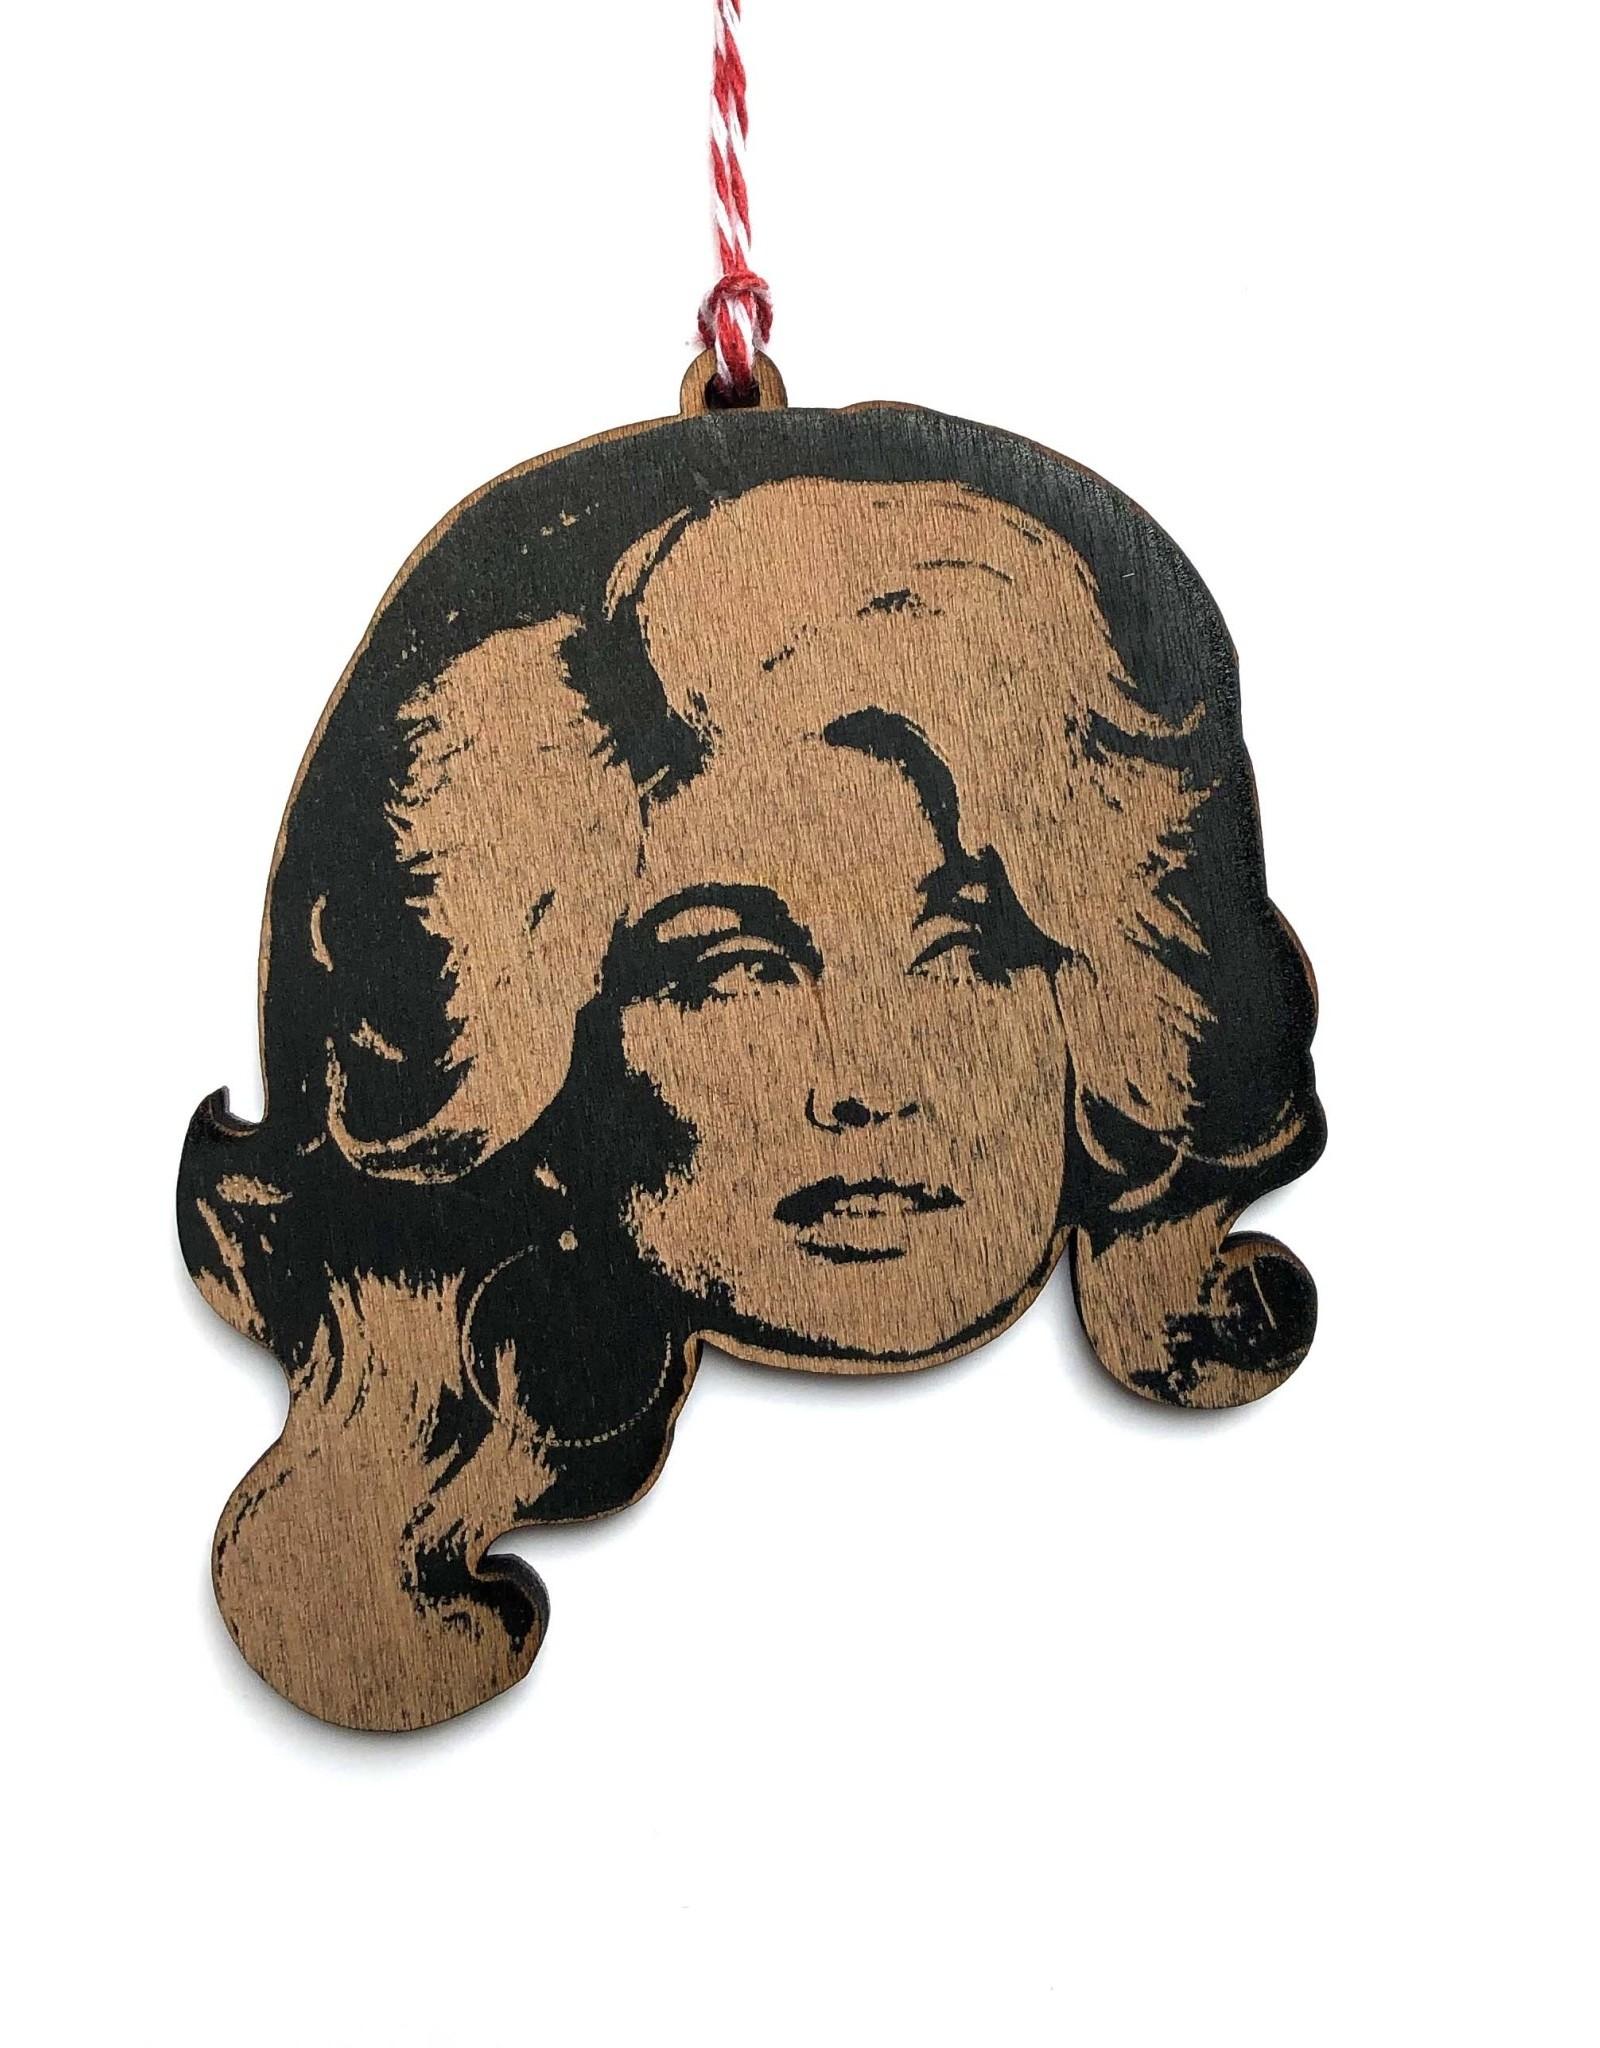 Dolly Parton Wooden Ornament